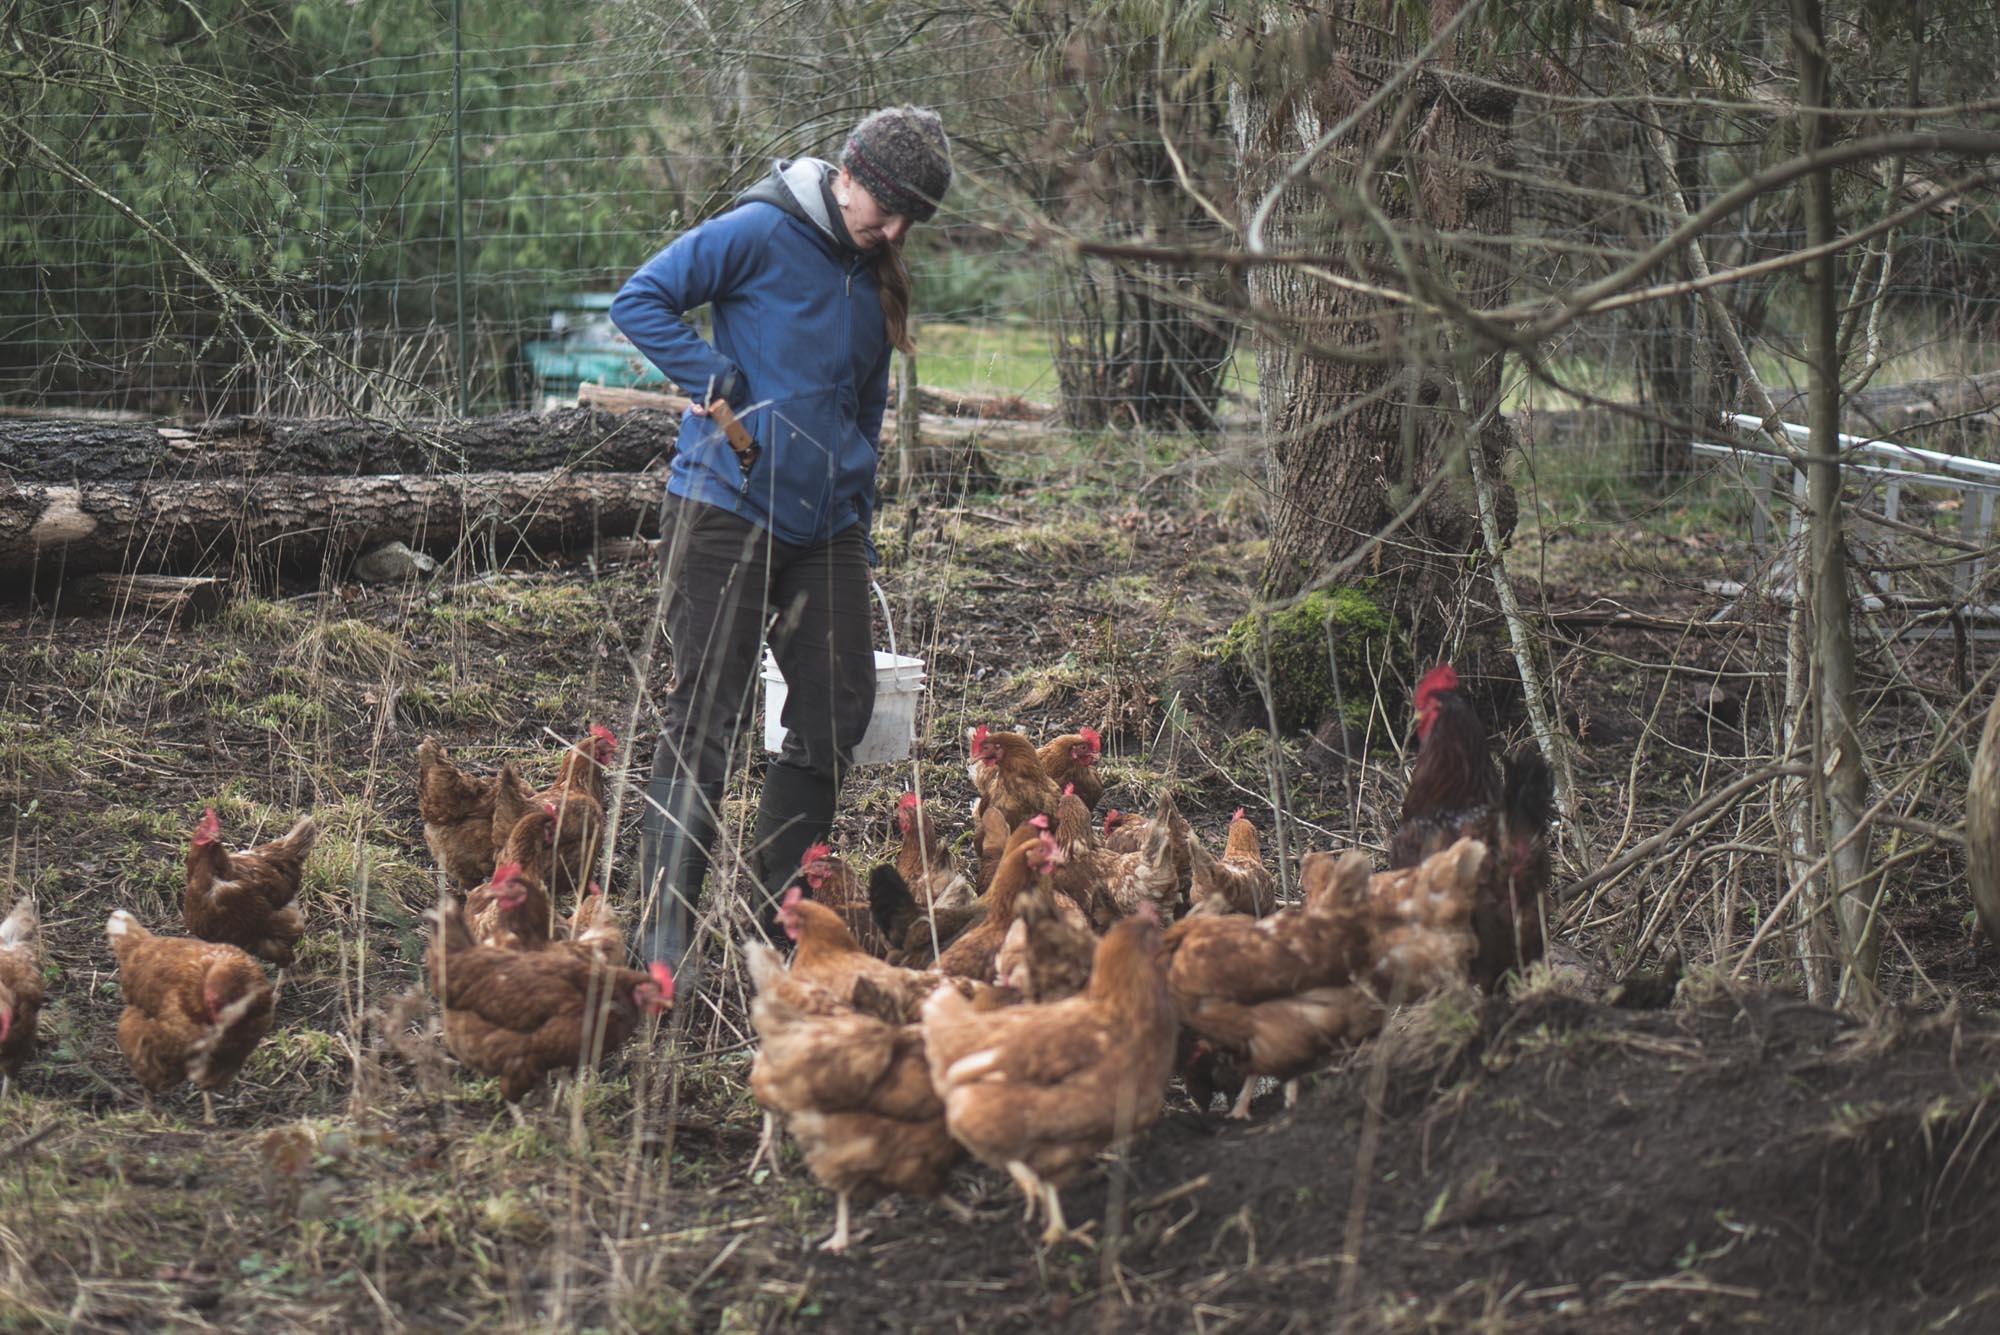 women-who-farm-over-grow-the-system-10.jpg